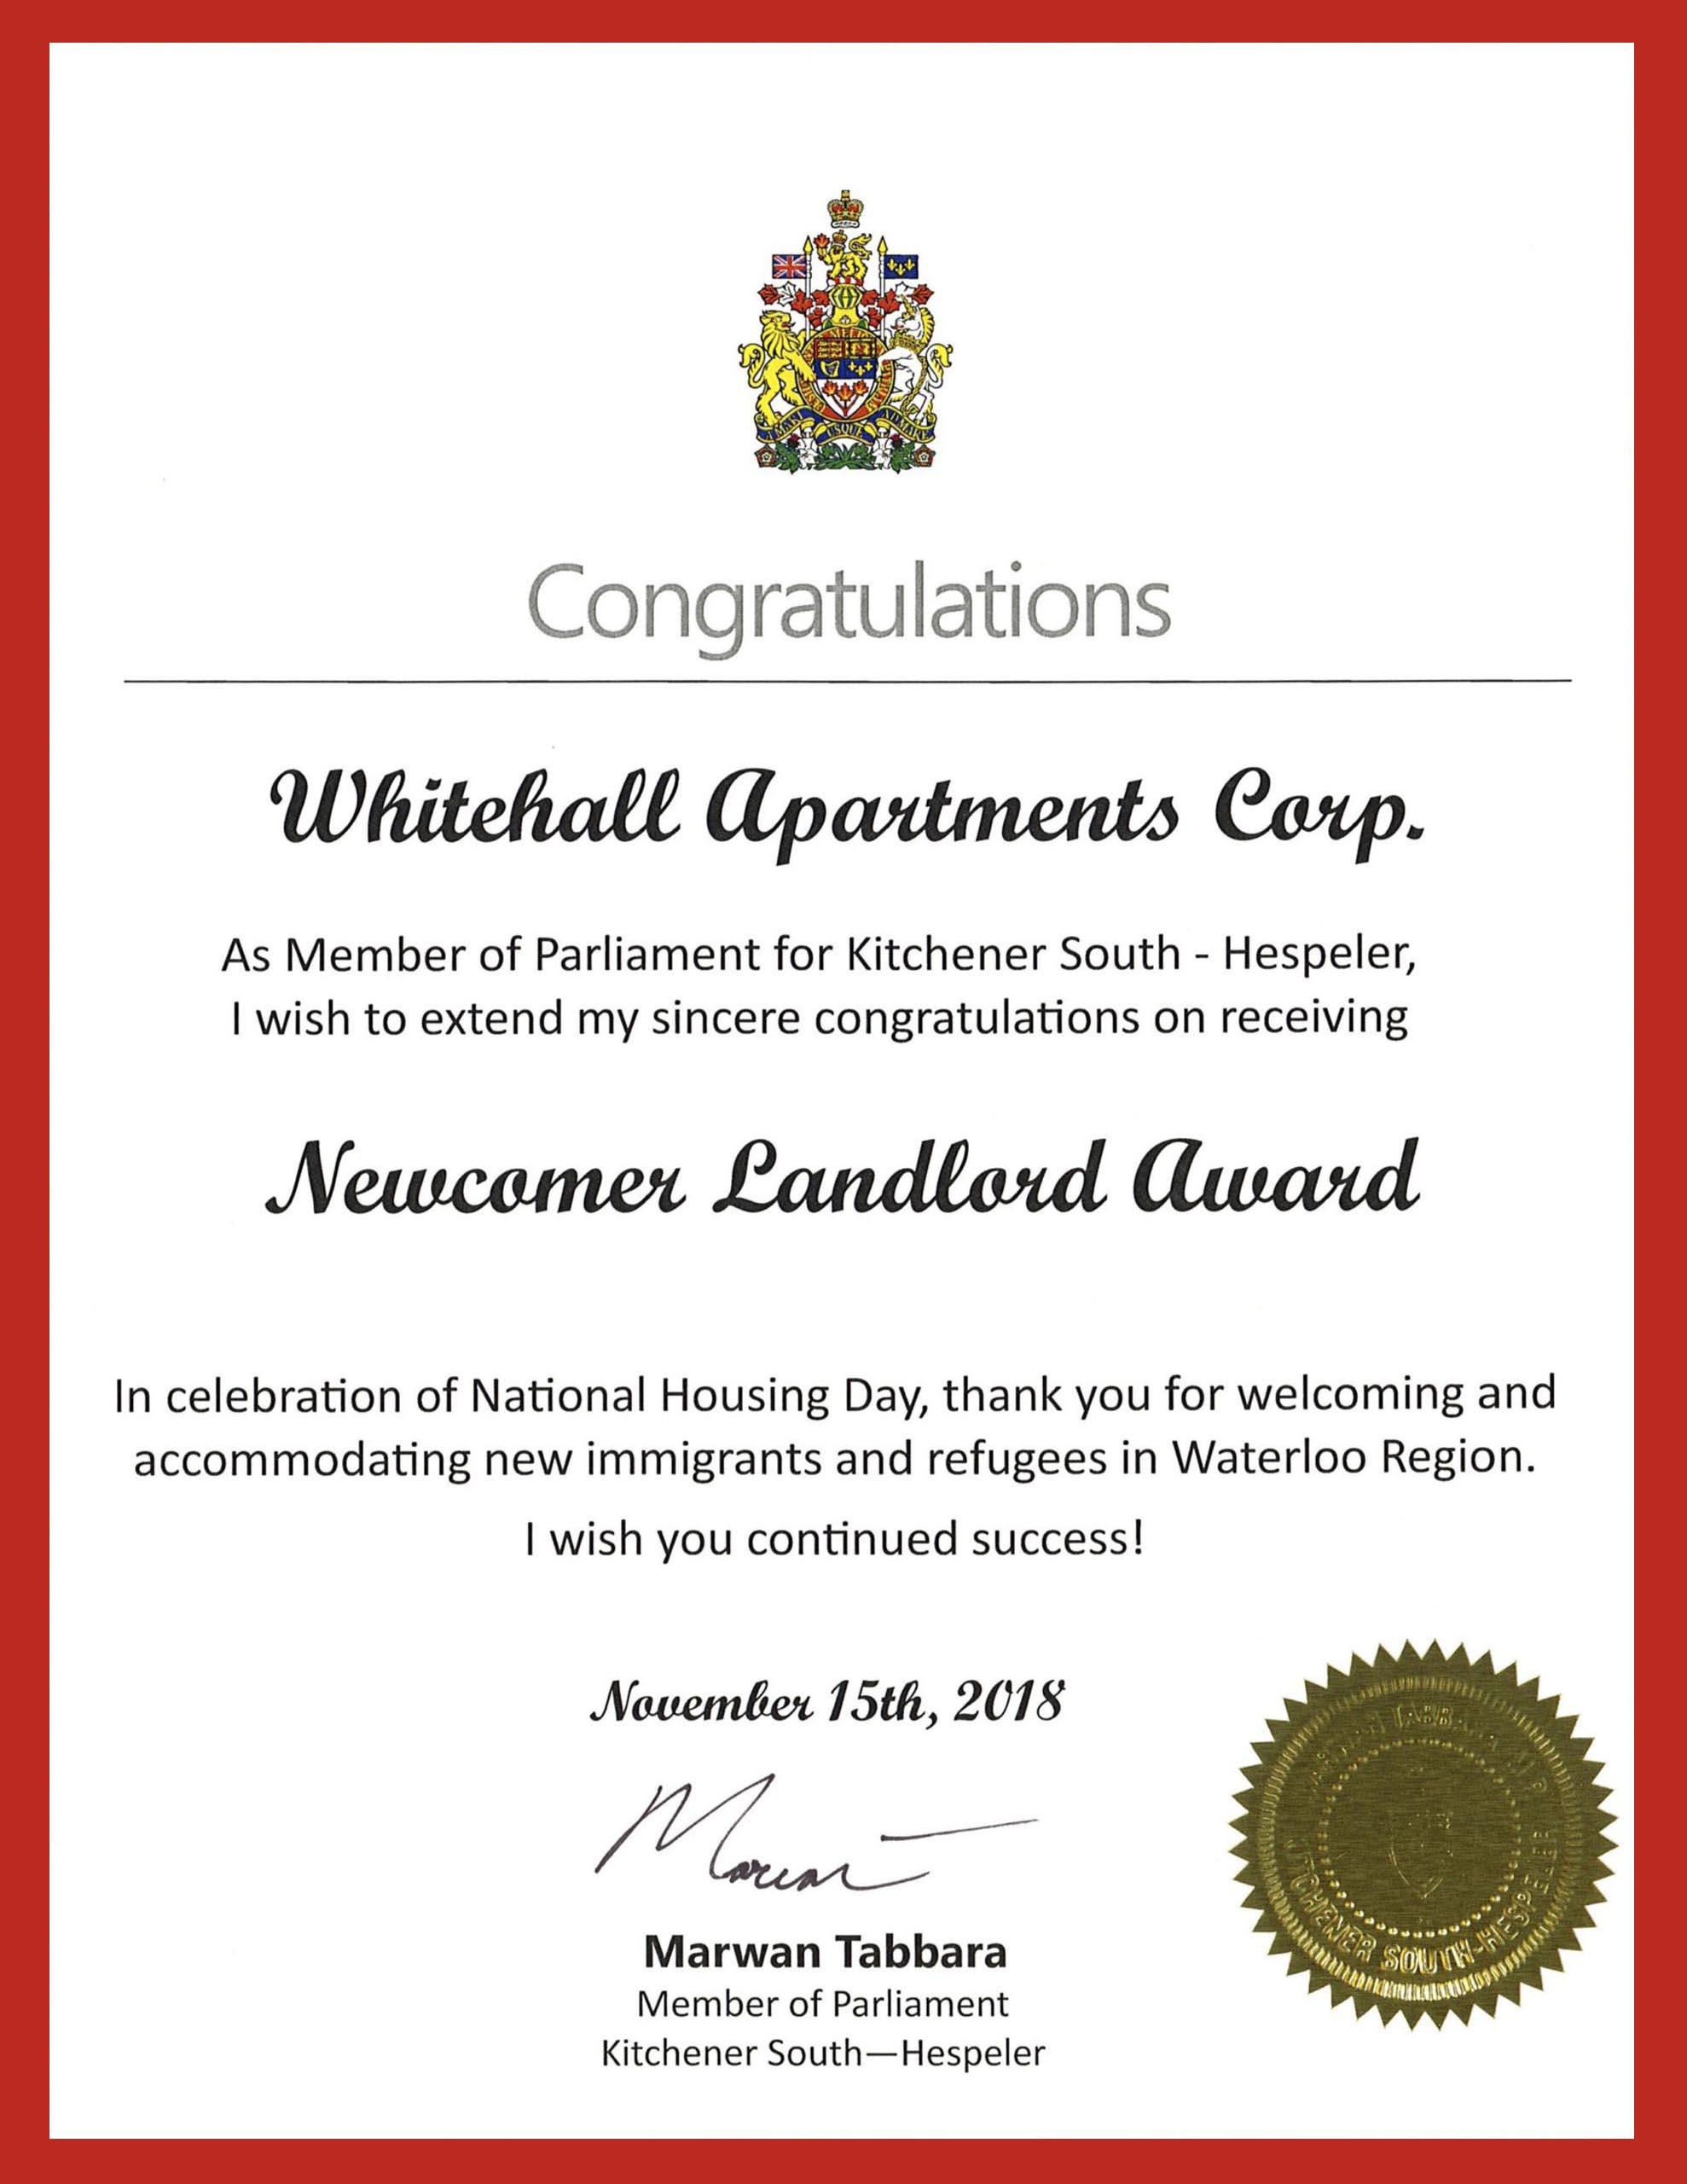 newcomer_landlord_award_2018_02-scaled04